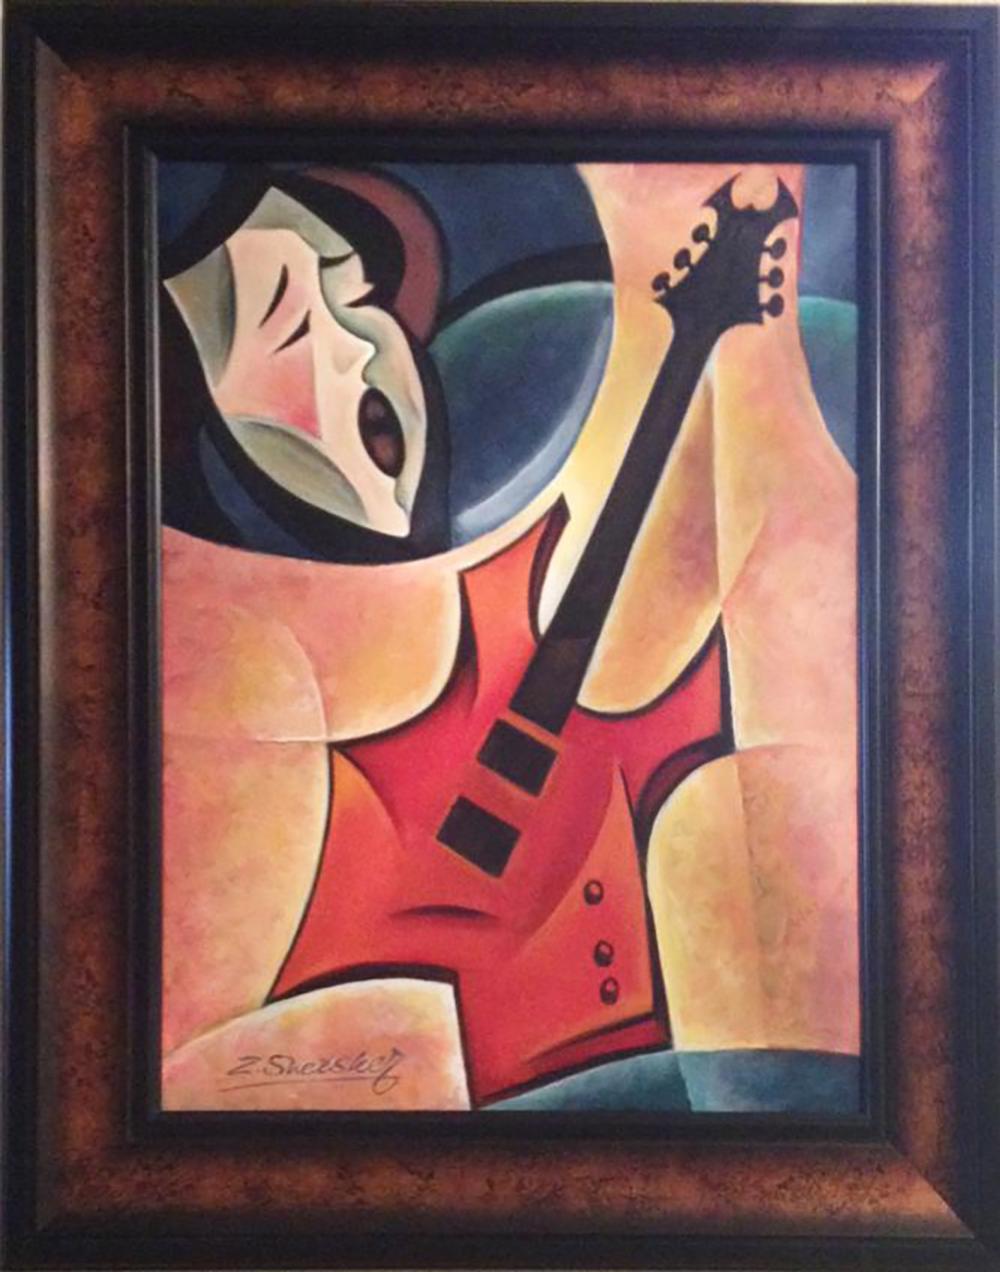 Zinovy Shersher Rock Guitar Mixed Media  Original Oil on canvas Rhapsody